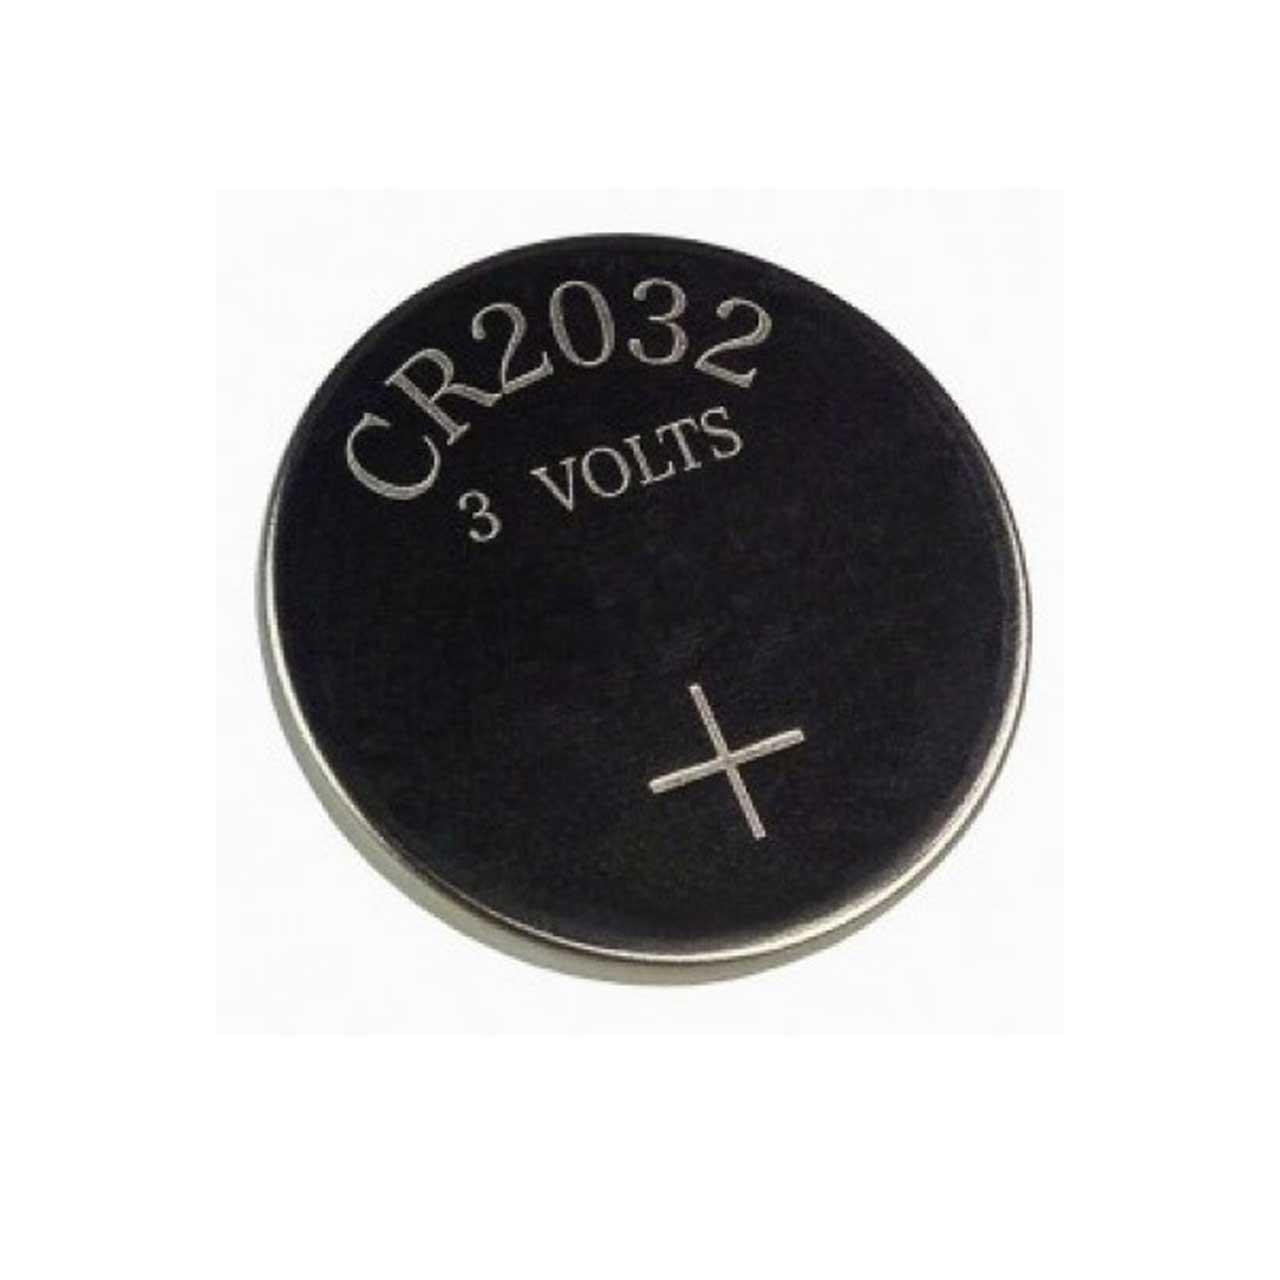 battery motherboard باتری بایوس مادربرد 2032